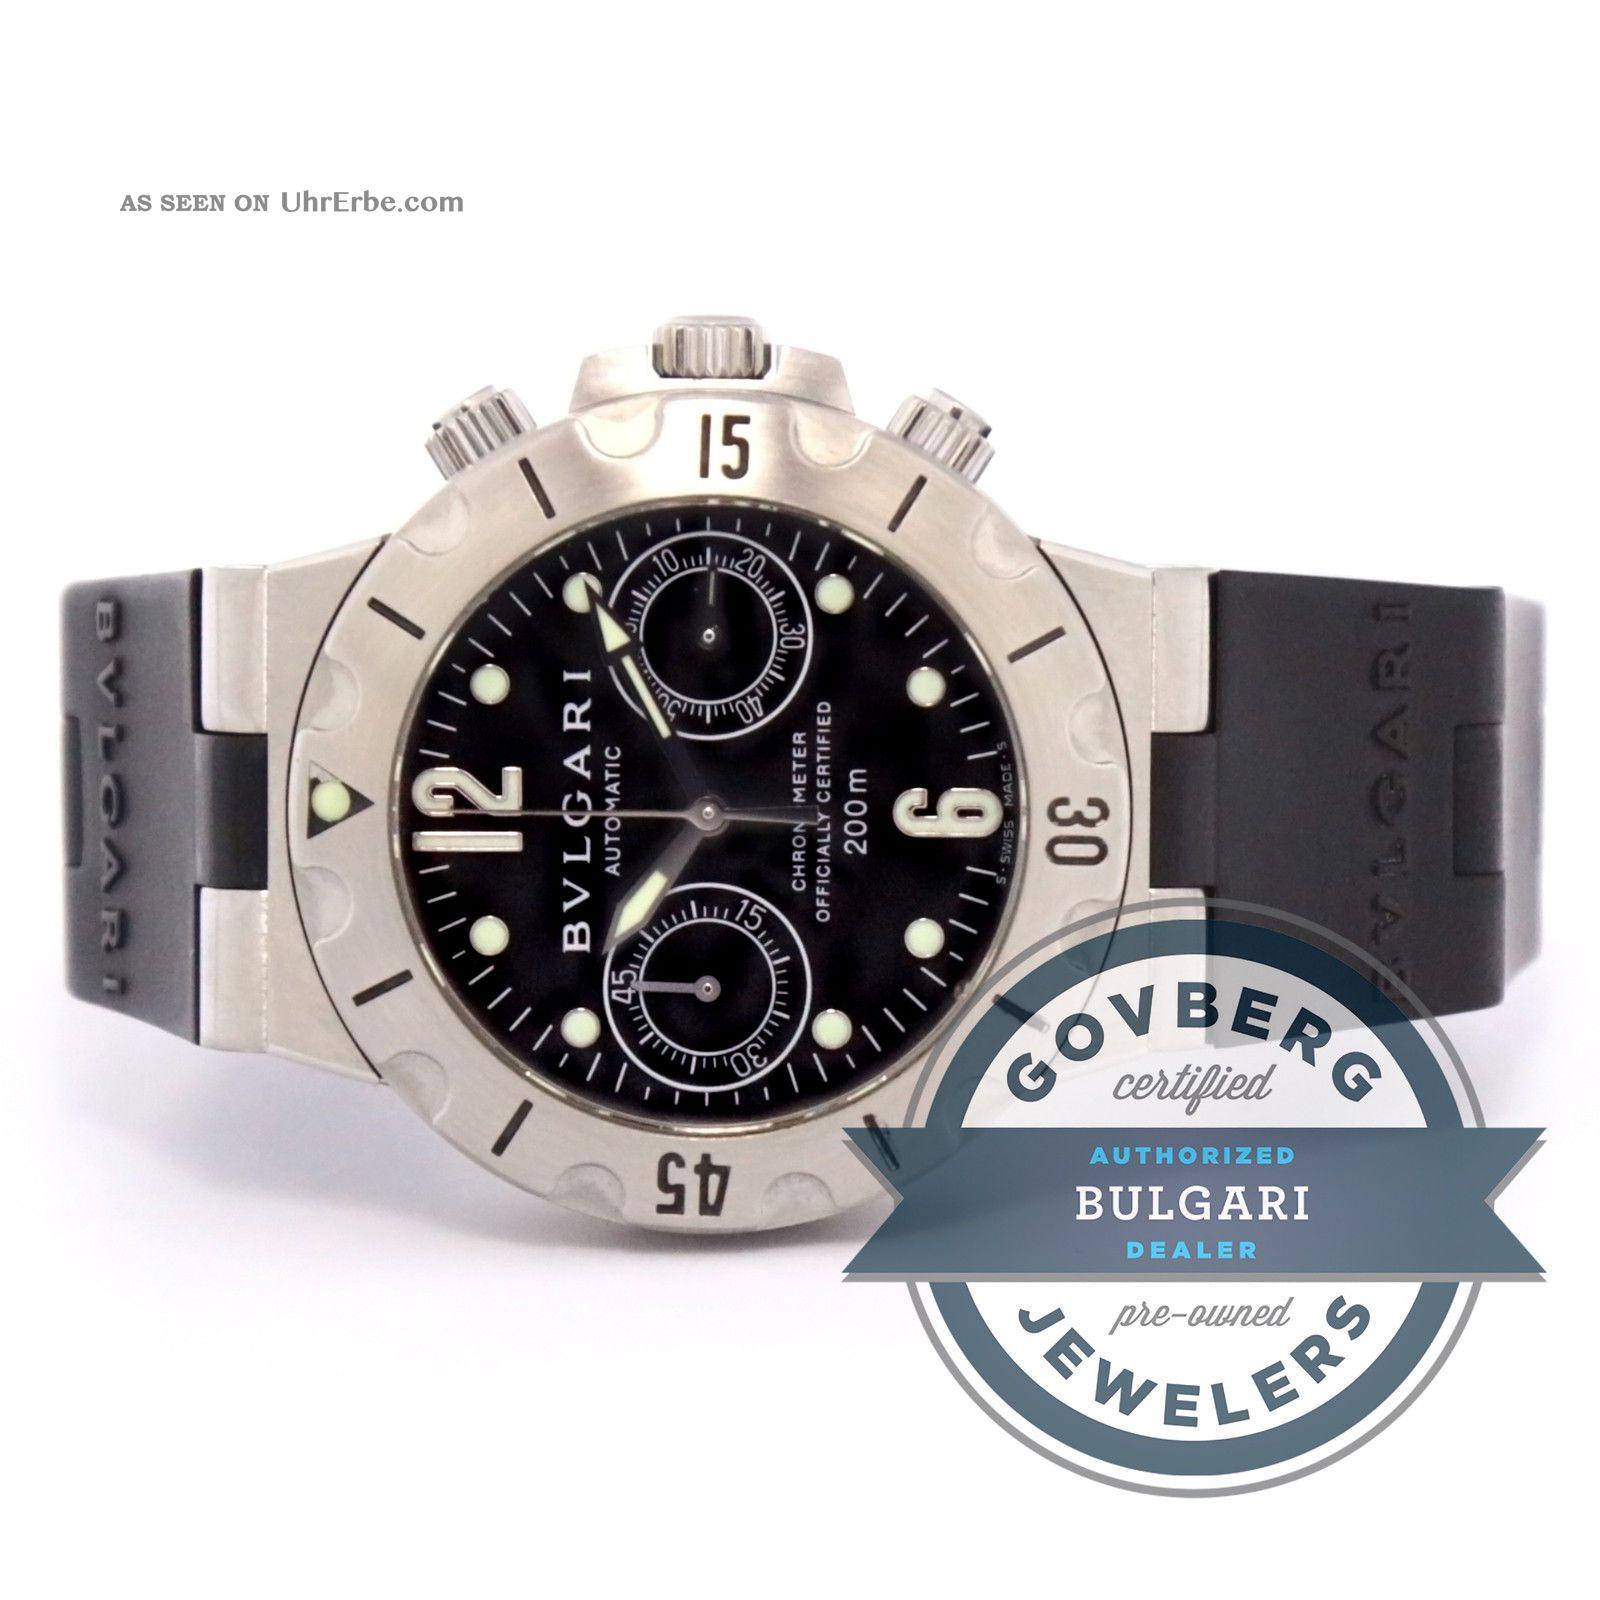 Bvlgari Diagono Scuba Čelik Automatski Chronograph Satovi Scb 38 S Armbanduhren Bild